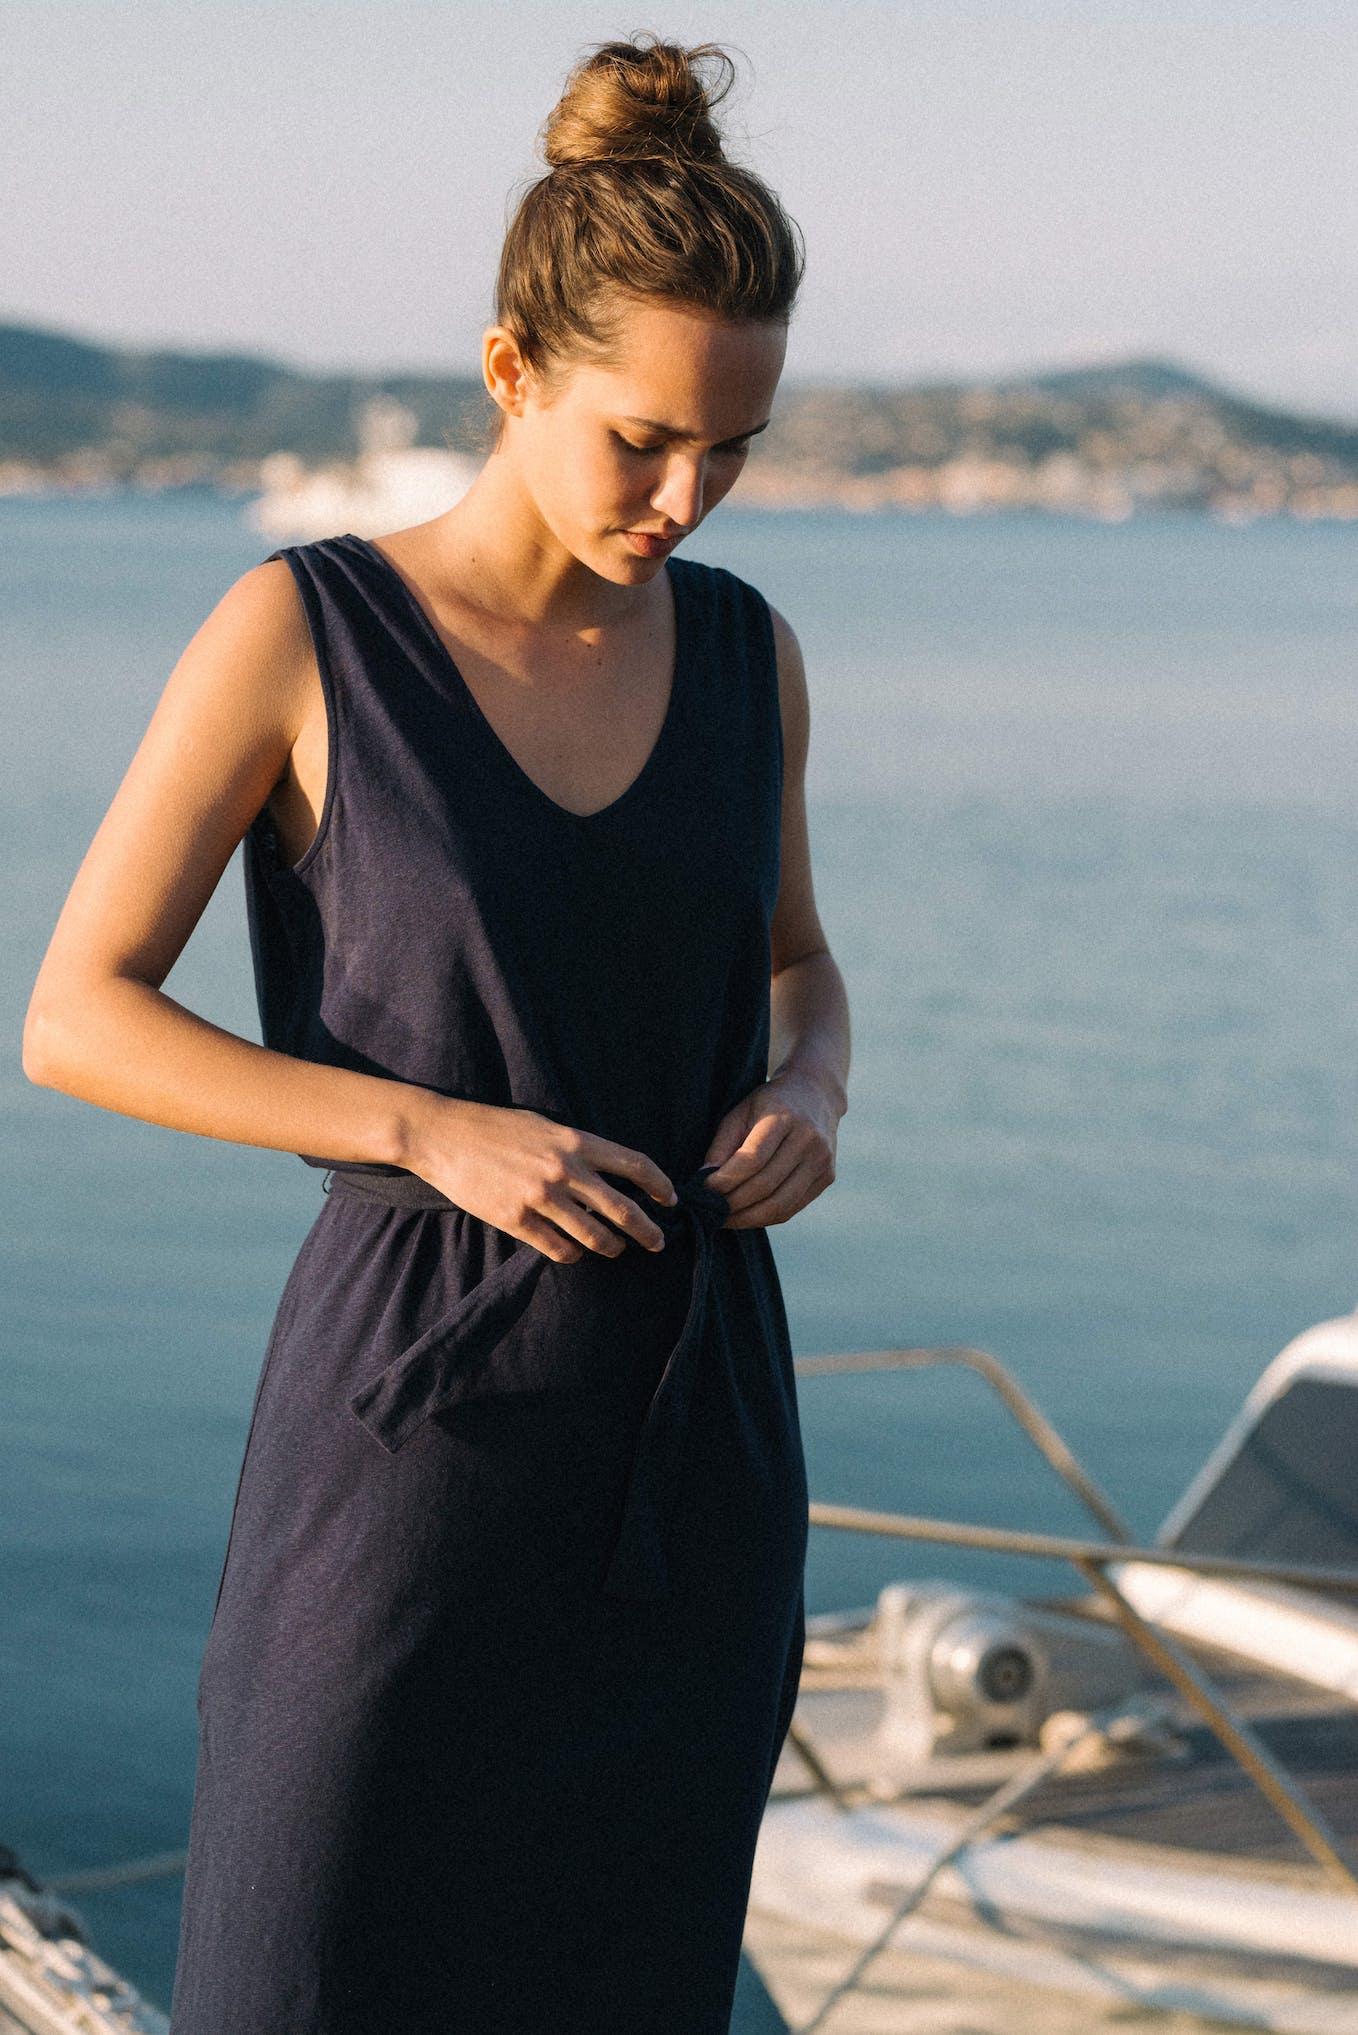 Dress Balade rêveuse in navy blue